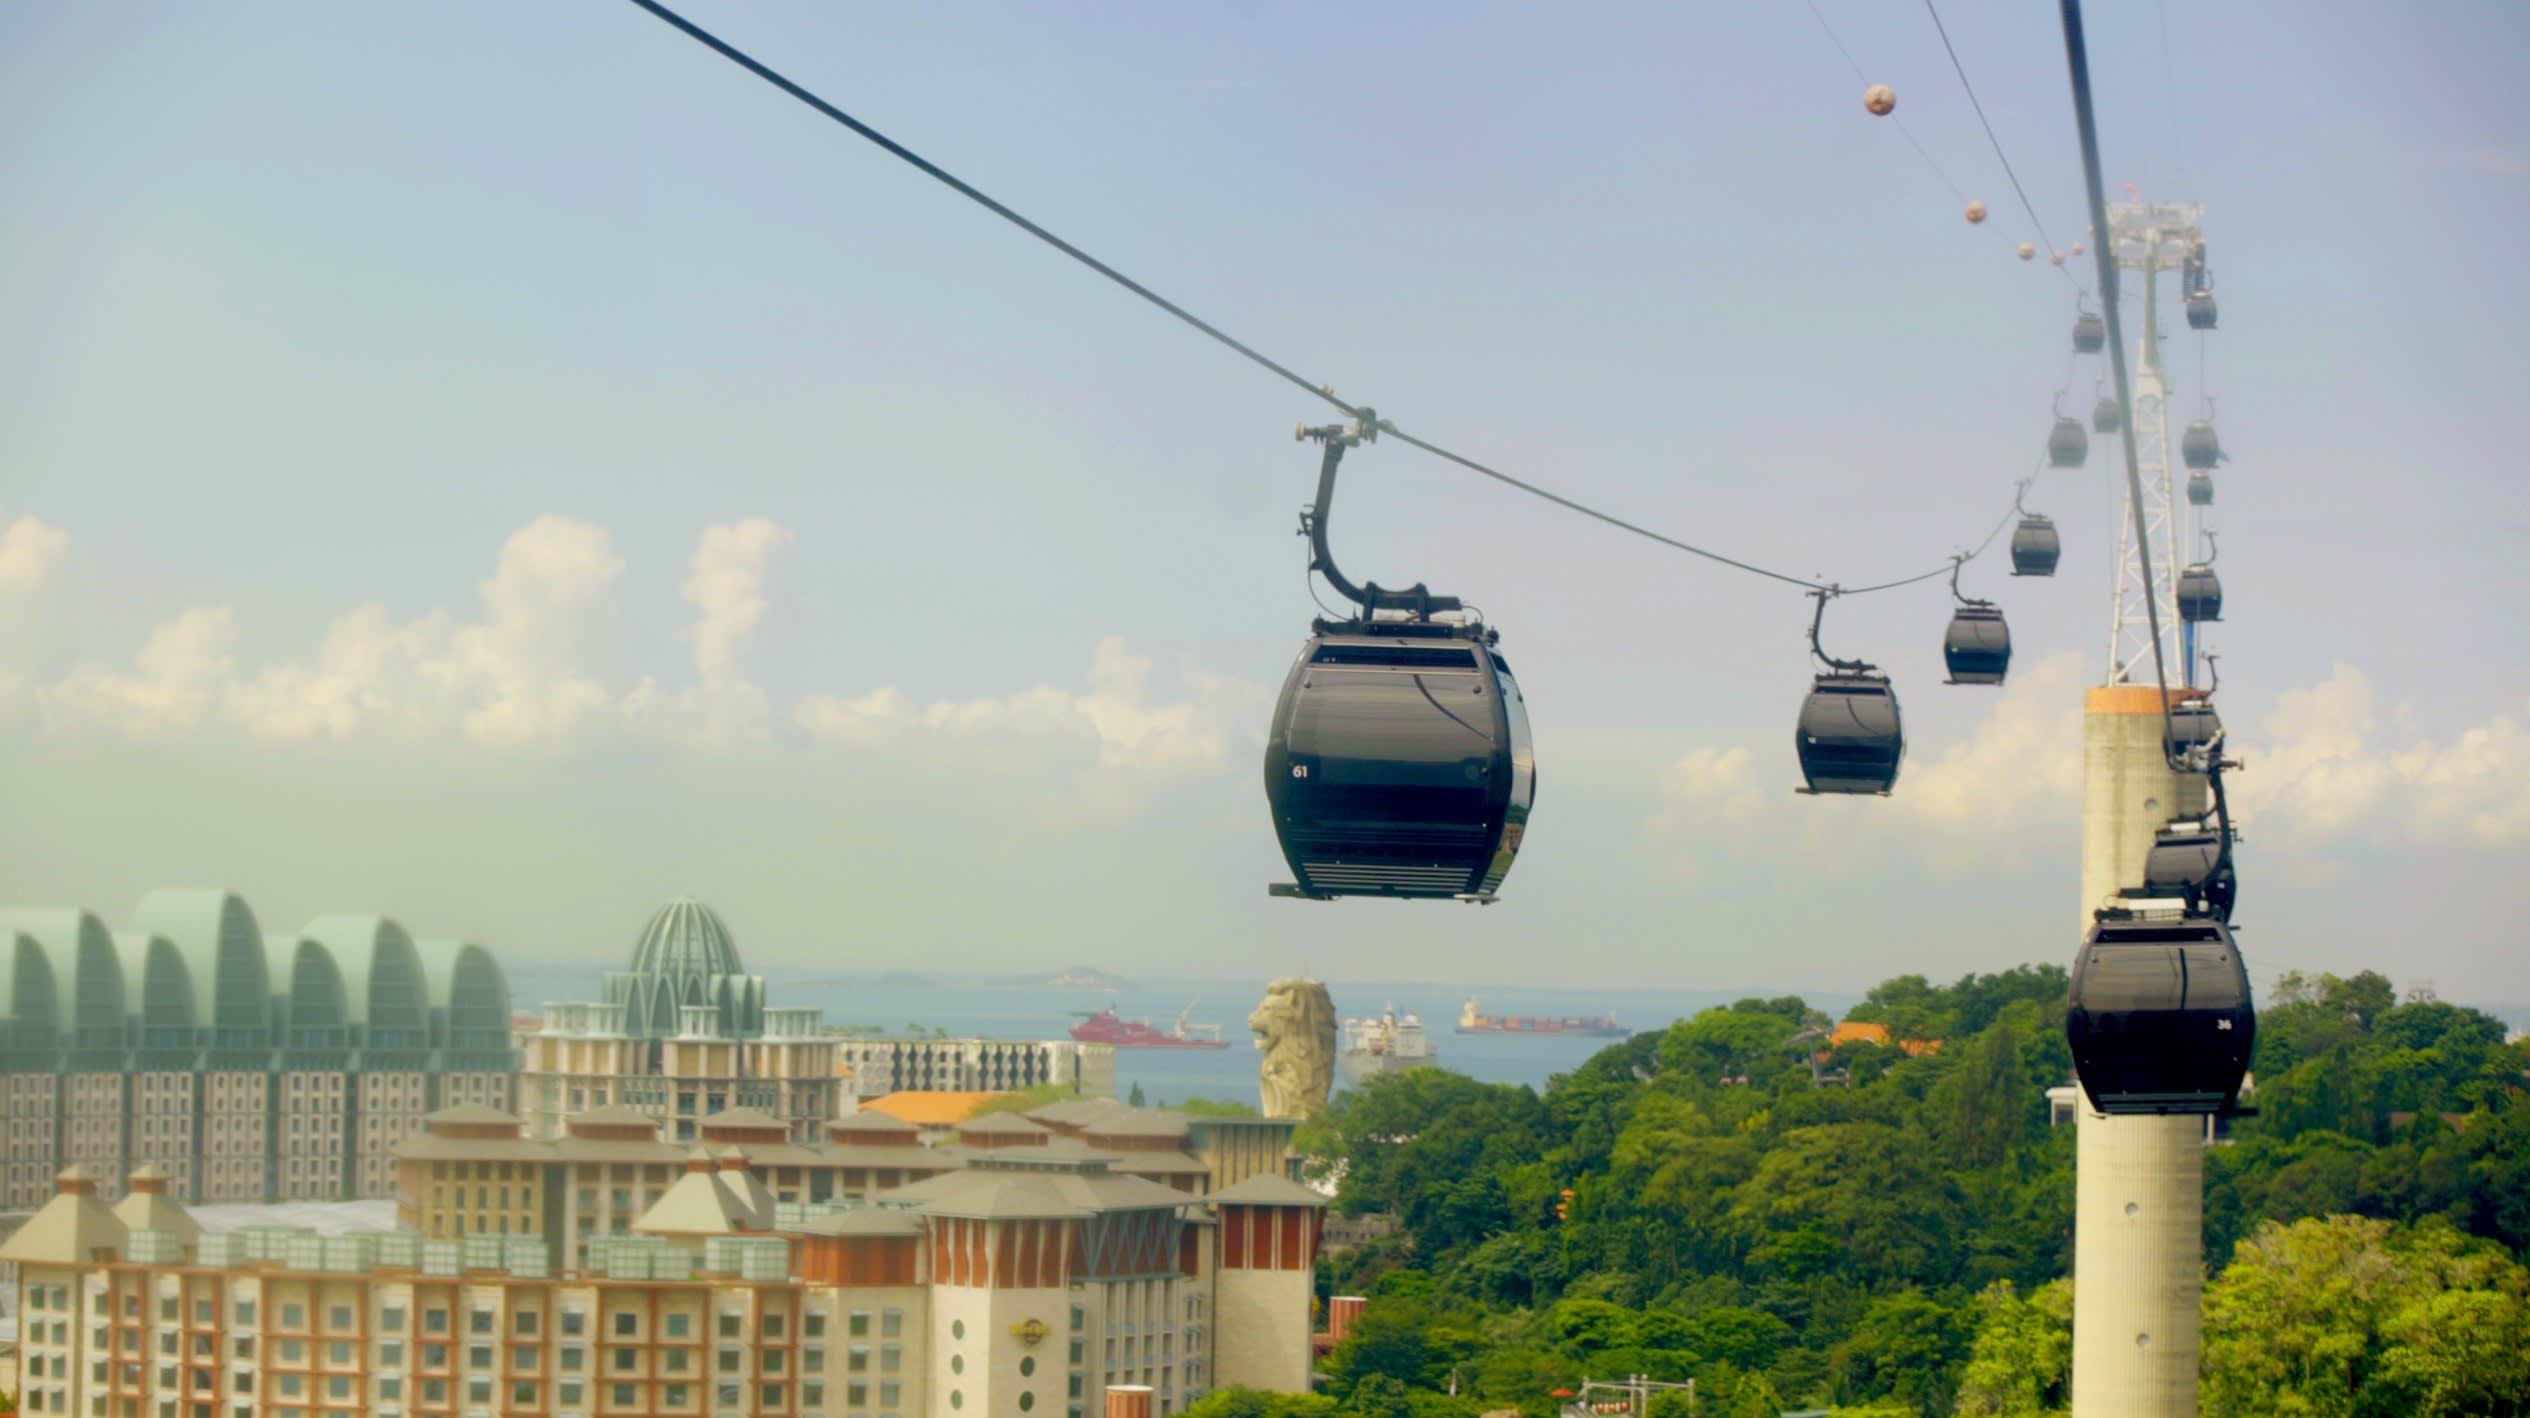 klook singapore gabbi garcia issa pressman cable car sentosa